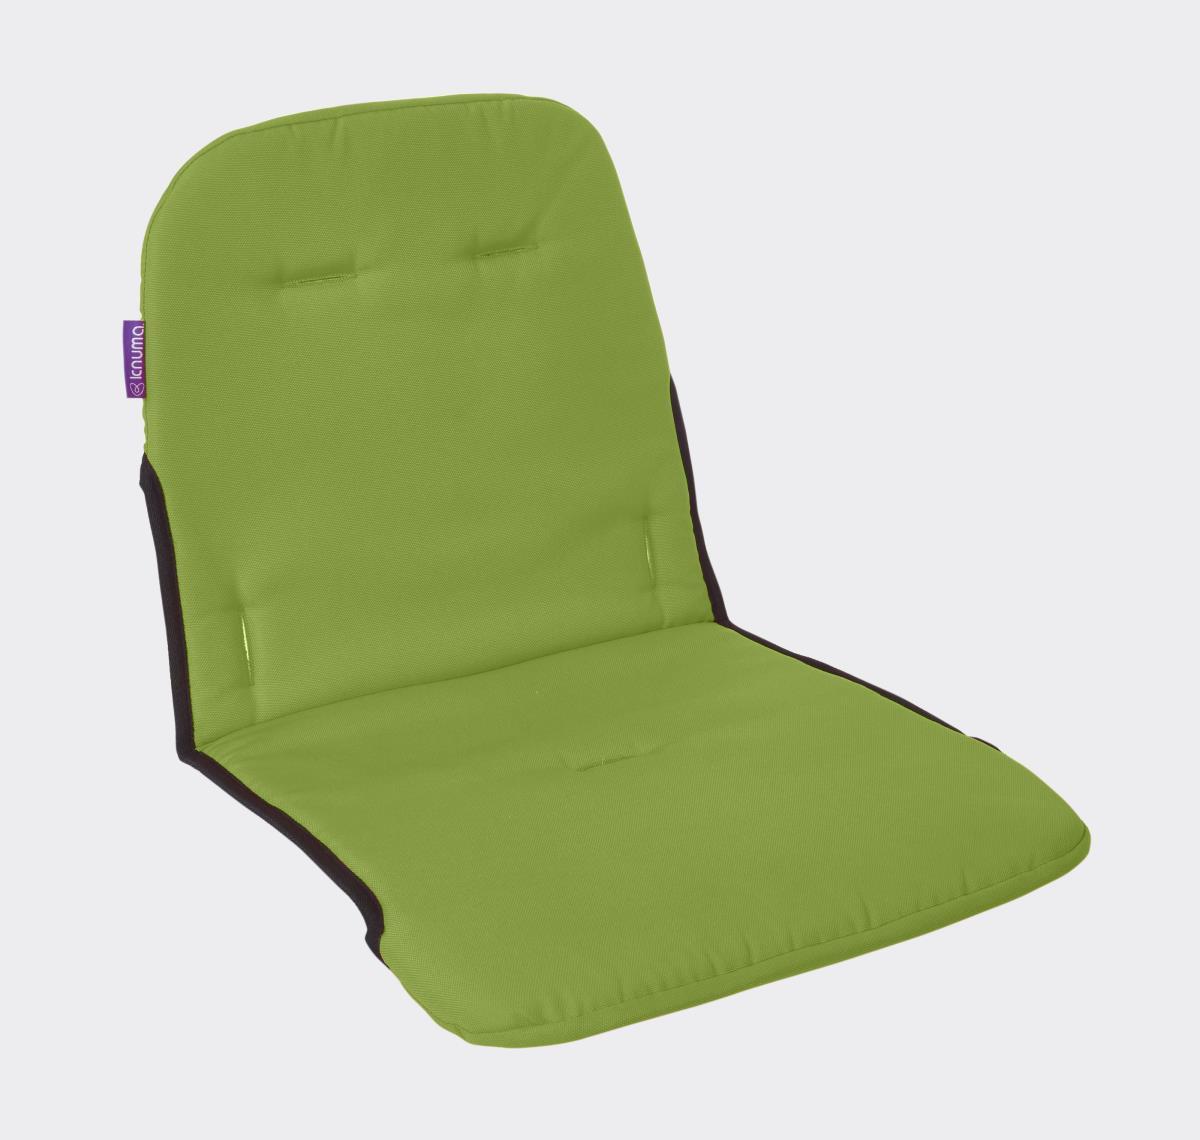 green high chair x rocker pro gaming highchair seat cushion lime knuma nursery furniture connect